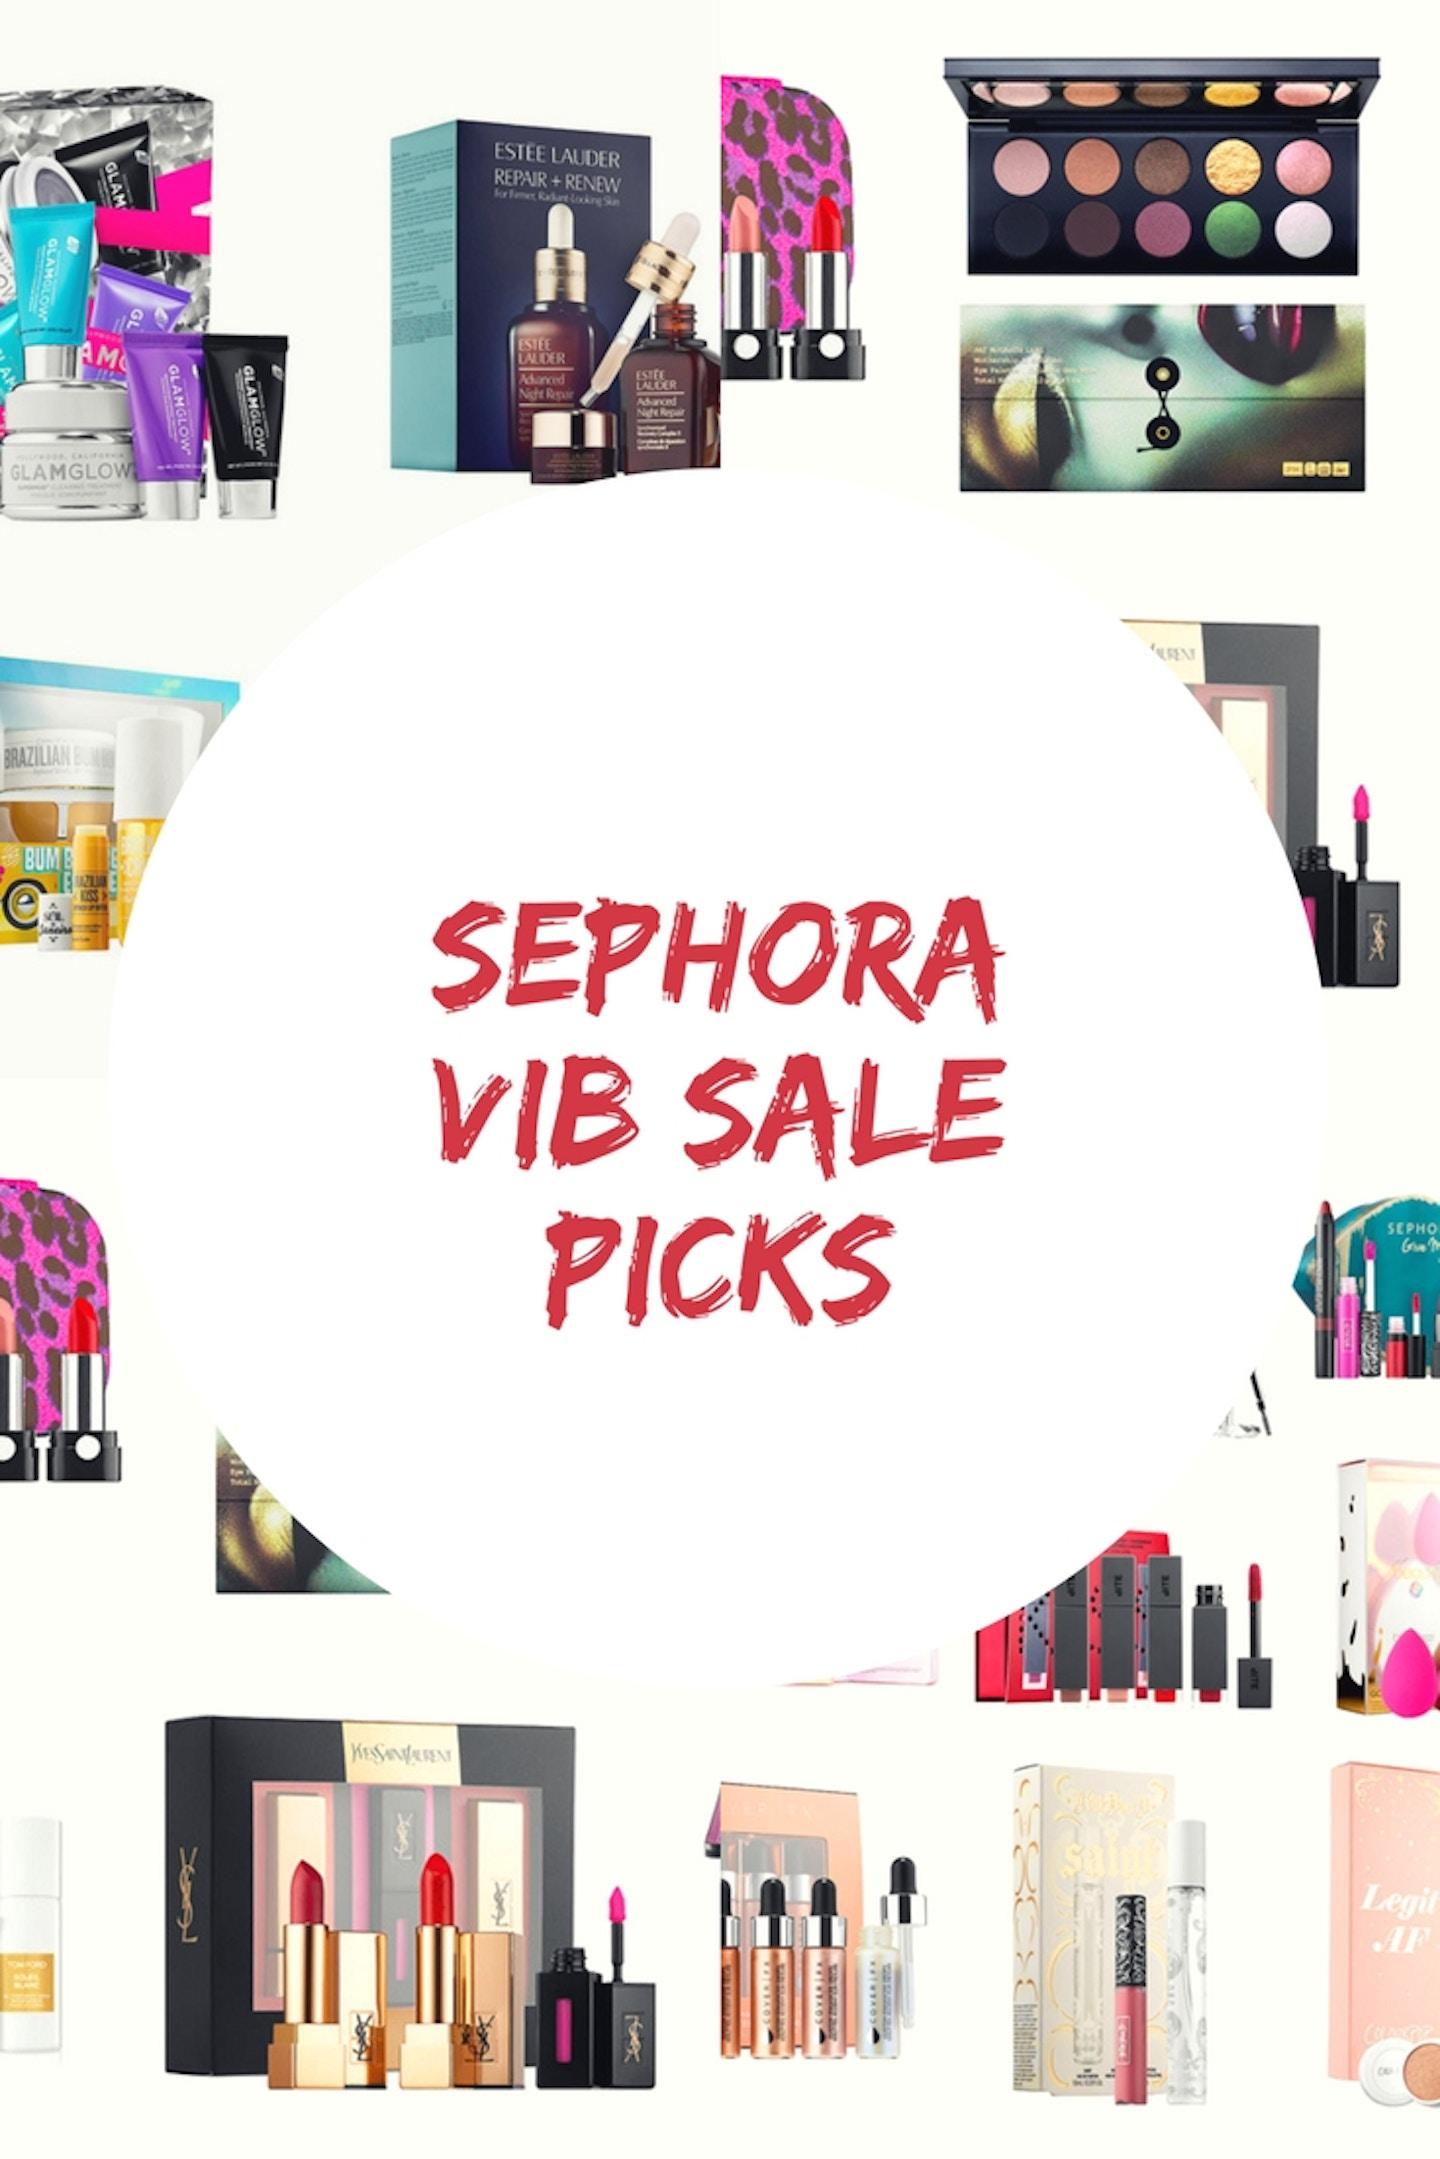 Sephora VIB Sale 2017 Picks